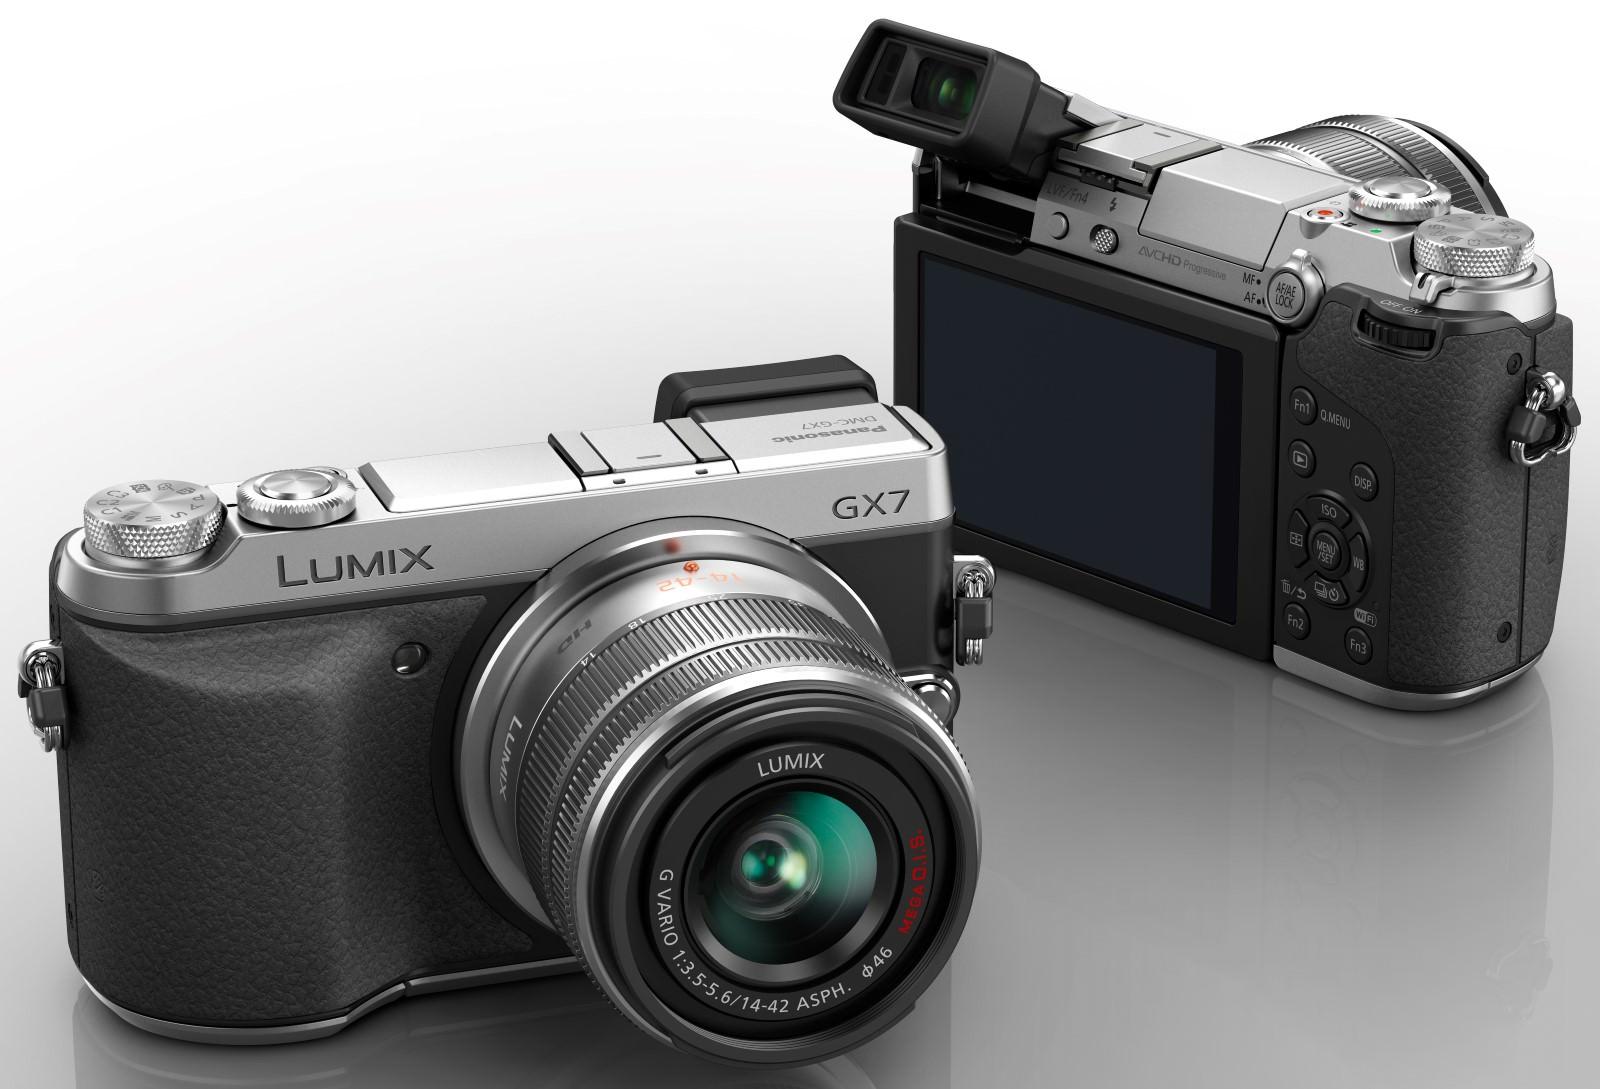 Panasonic Lumix DMC-GX7 DSLM Camera Announced | ePHOTOzine